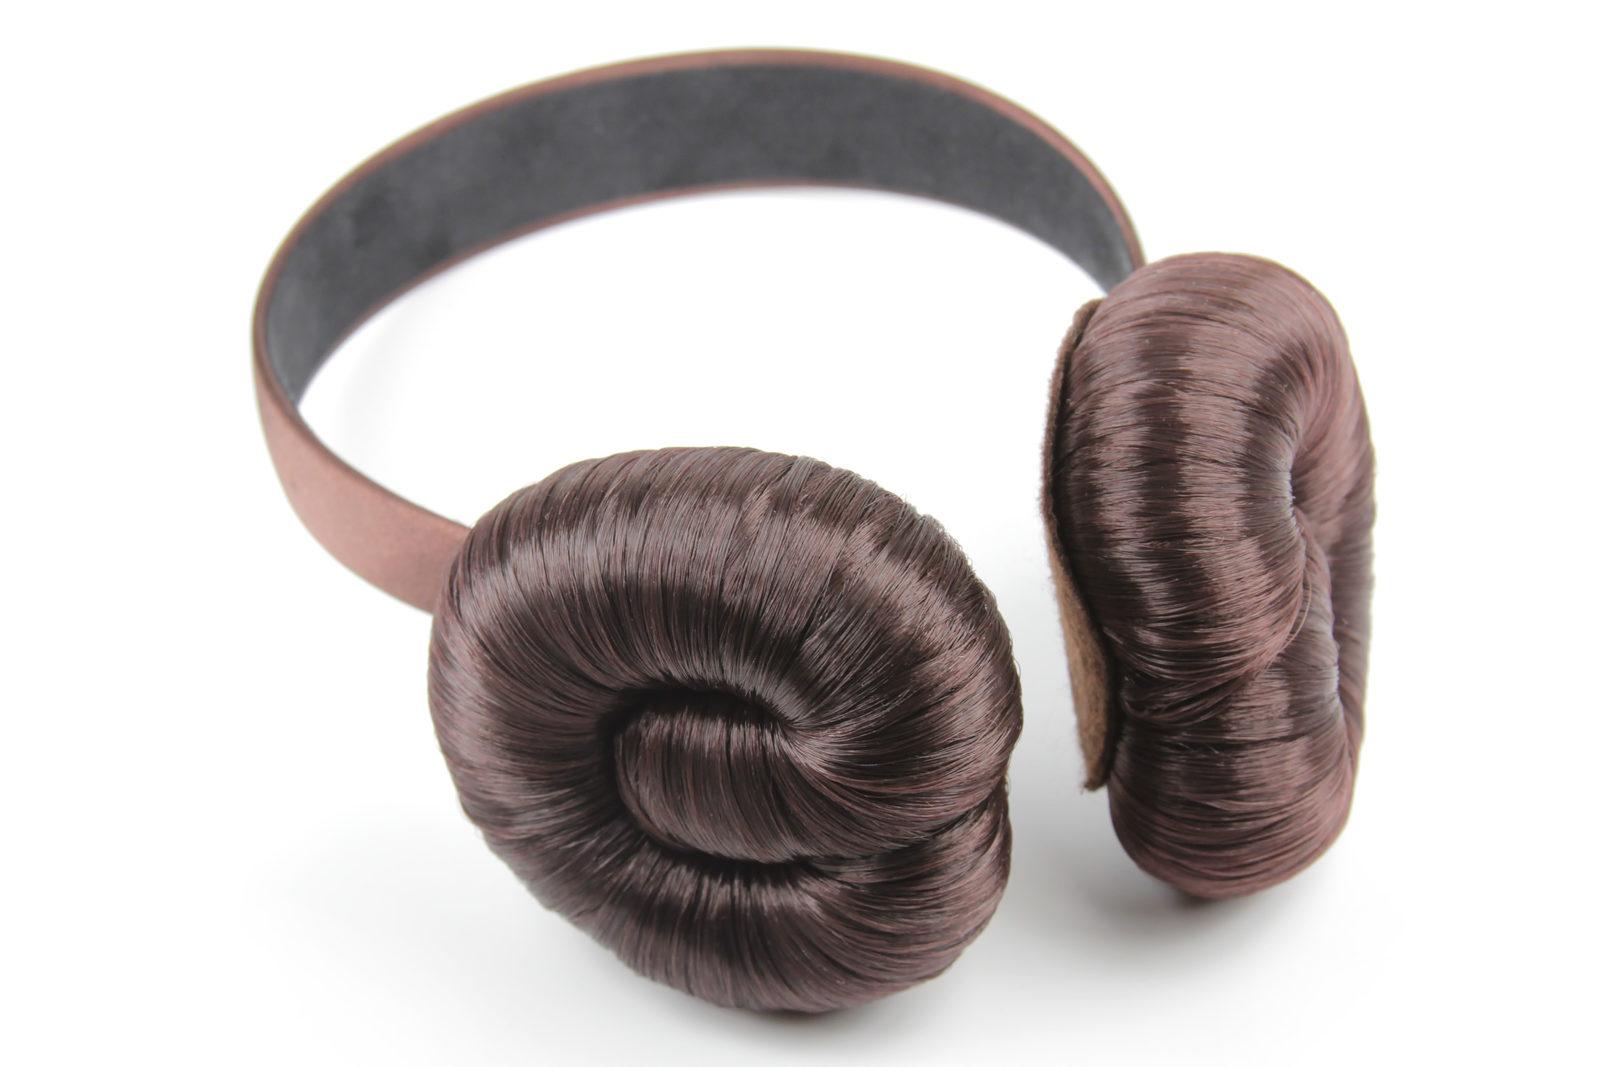 Review – Loungefly Princess Leia Headband